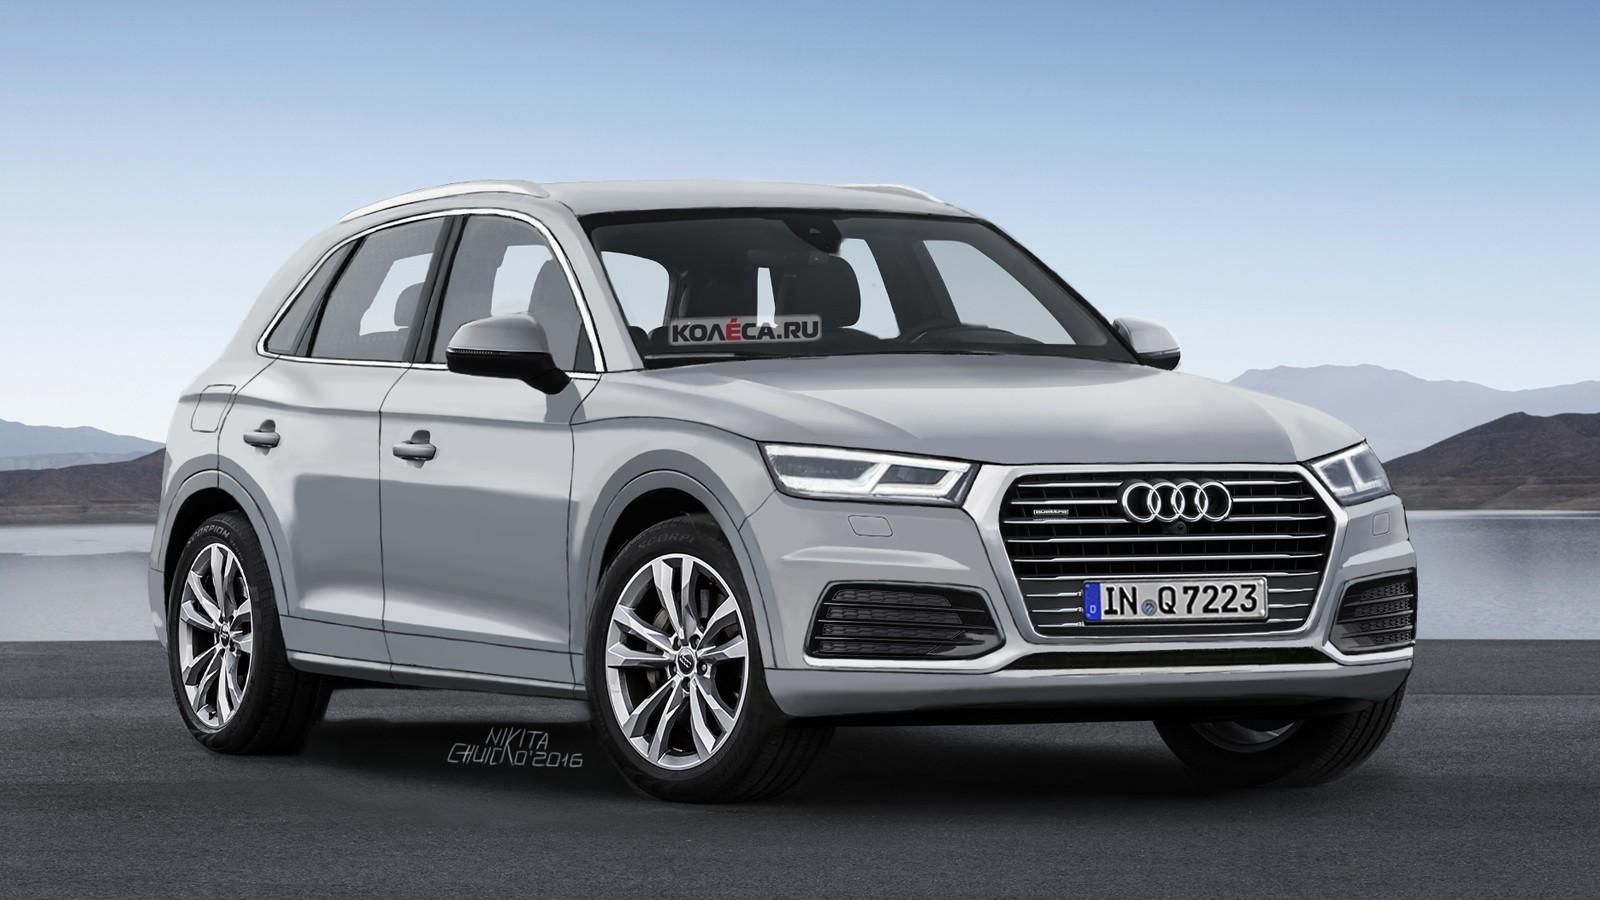 Audi Q5 render front